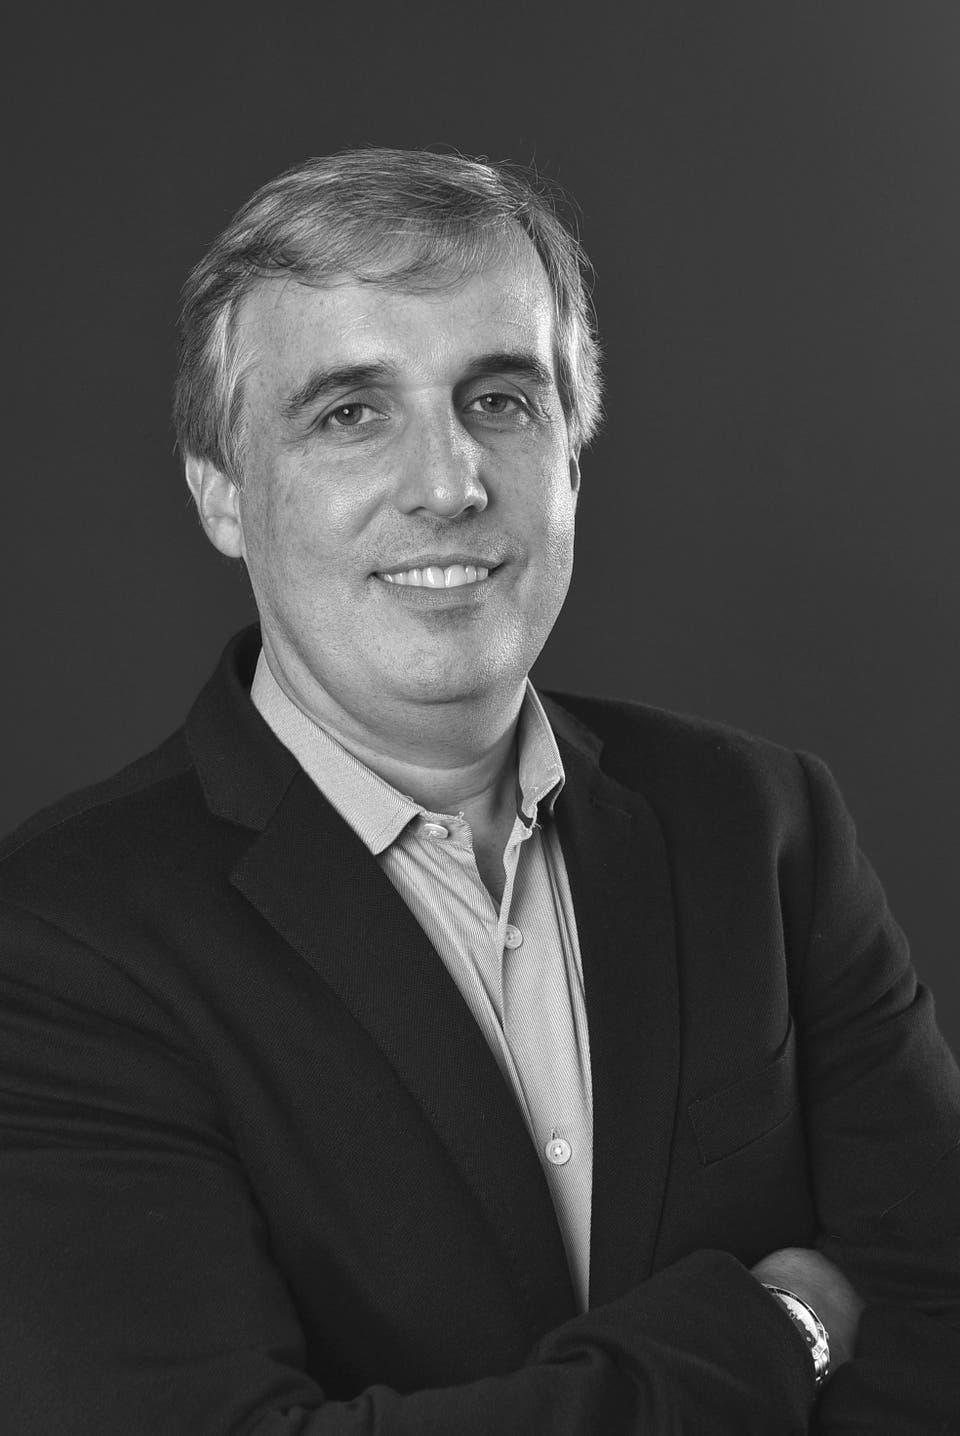 Antonio Cipriano